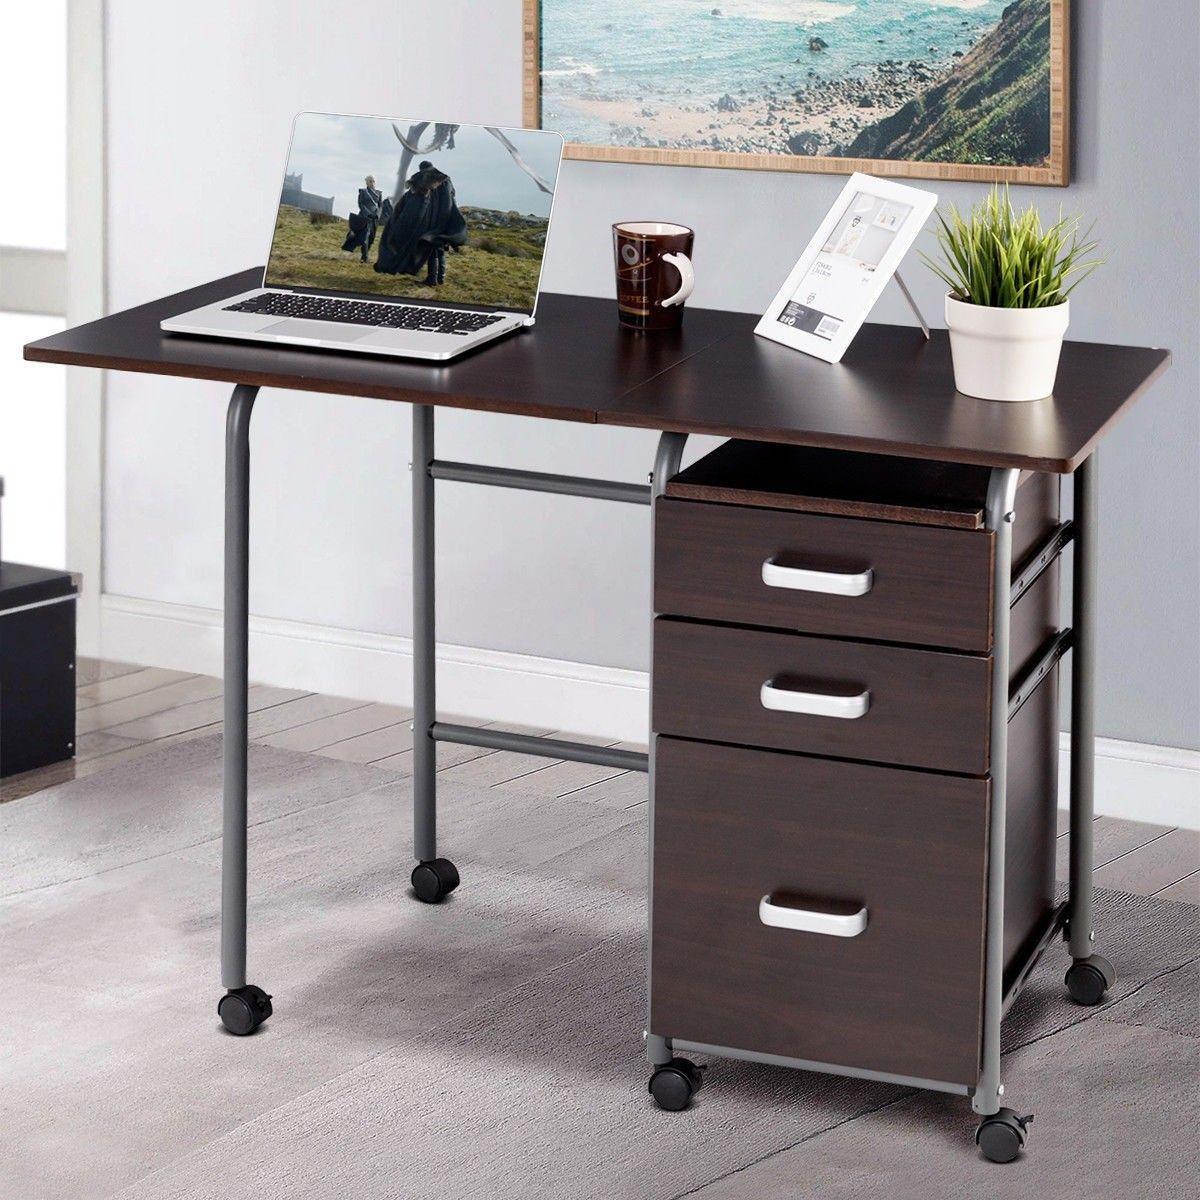 Folding computer laptop desk wheeled home office furniture